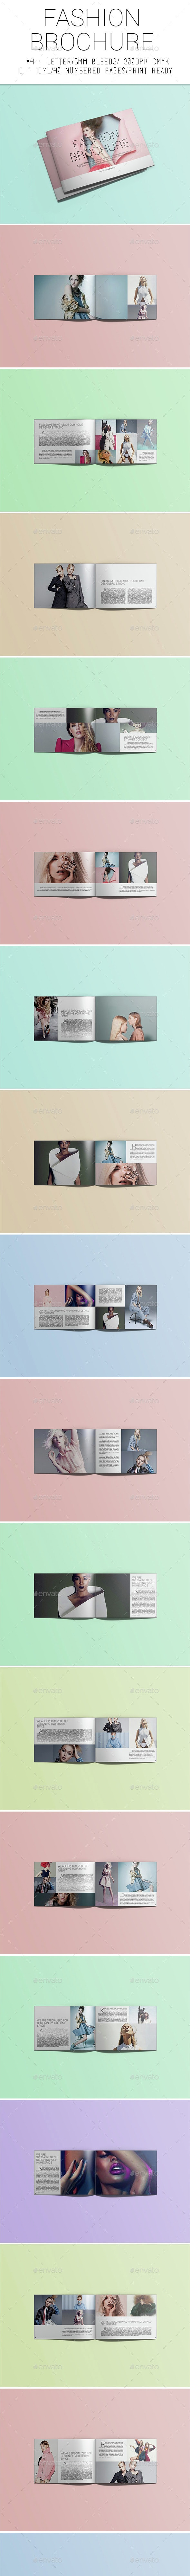 Fashion Brochure - Magazines Print Templates